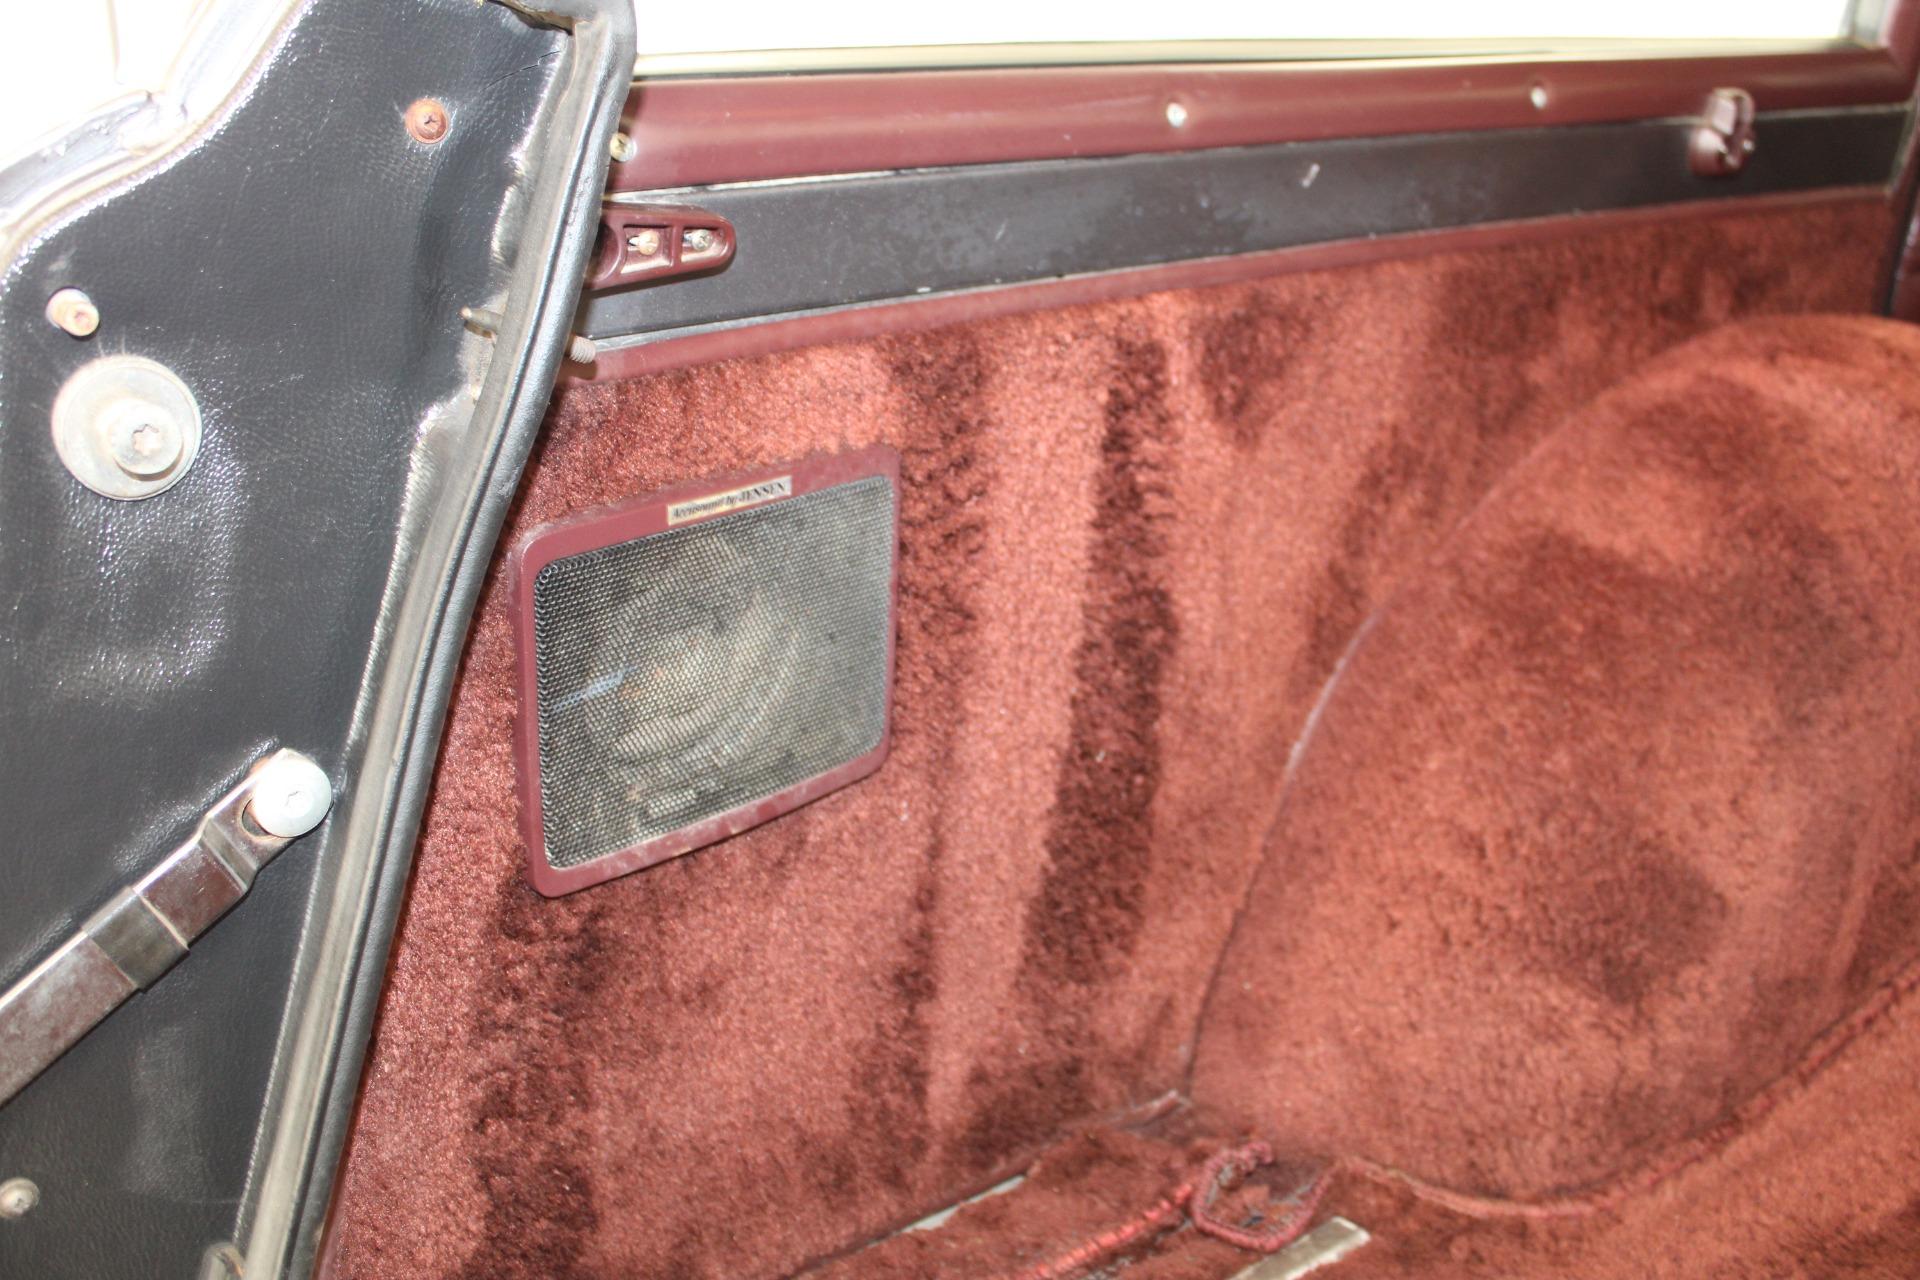 Used-1989-Jeep-Grand-Wagoneer-LS400